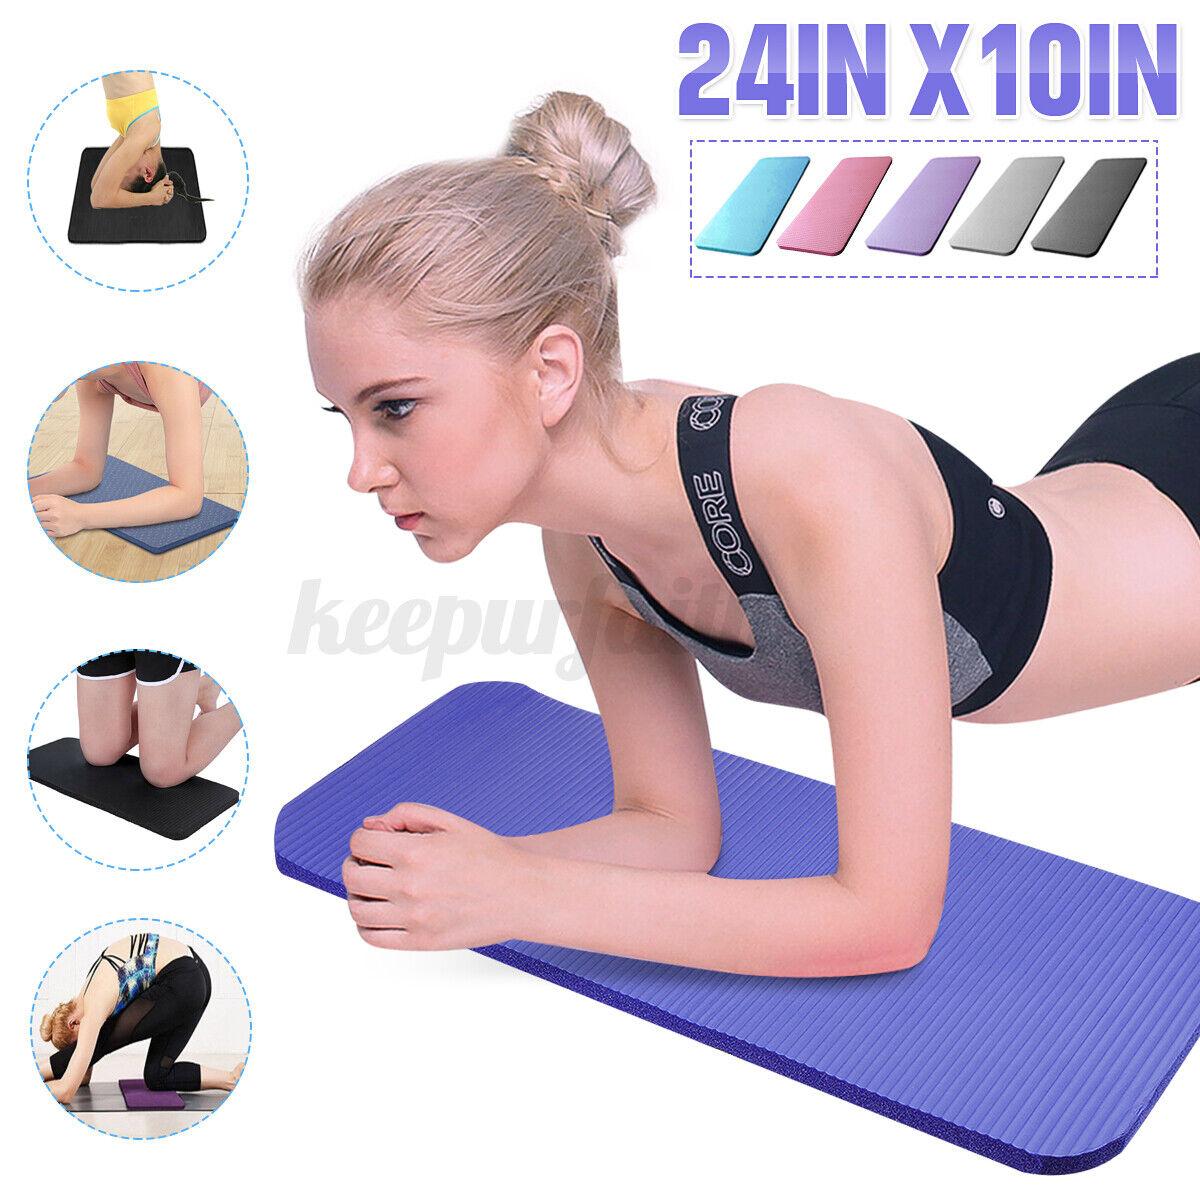 24''X10'' Yoga Knee Pad Cushion Anti-Slip 15mm Thick Workout